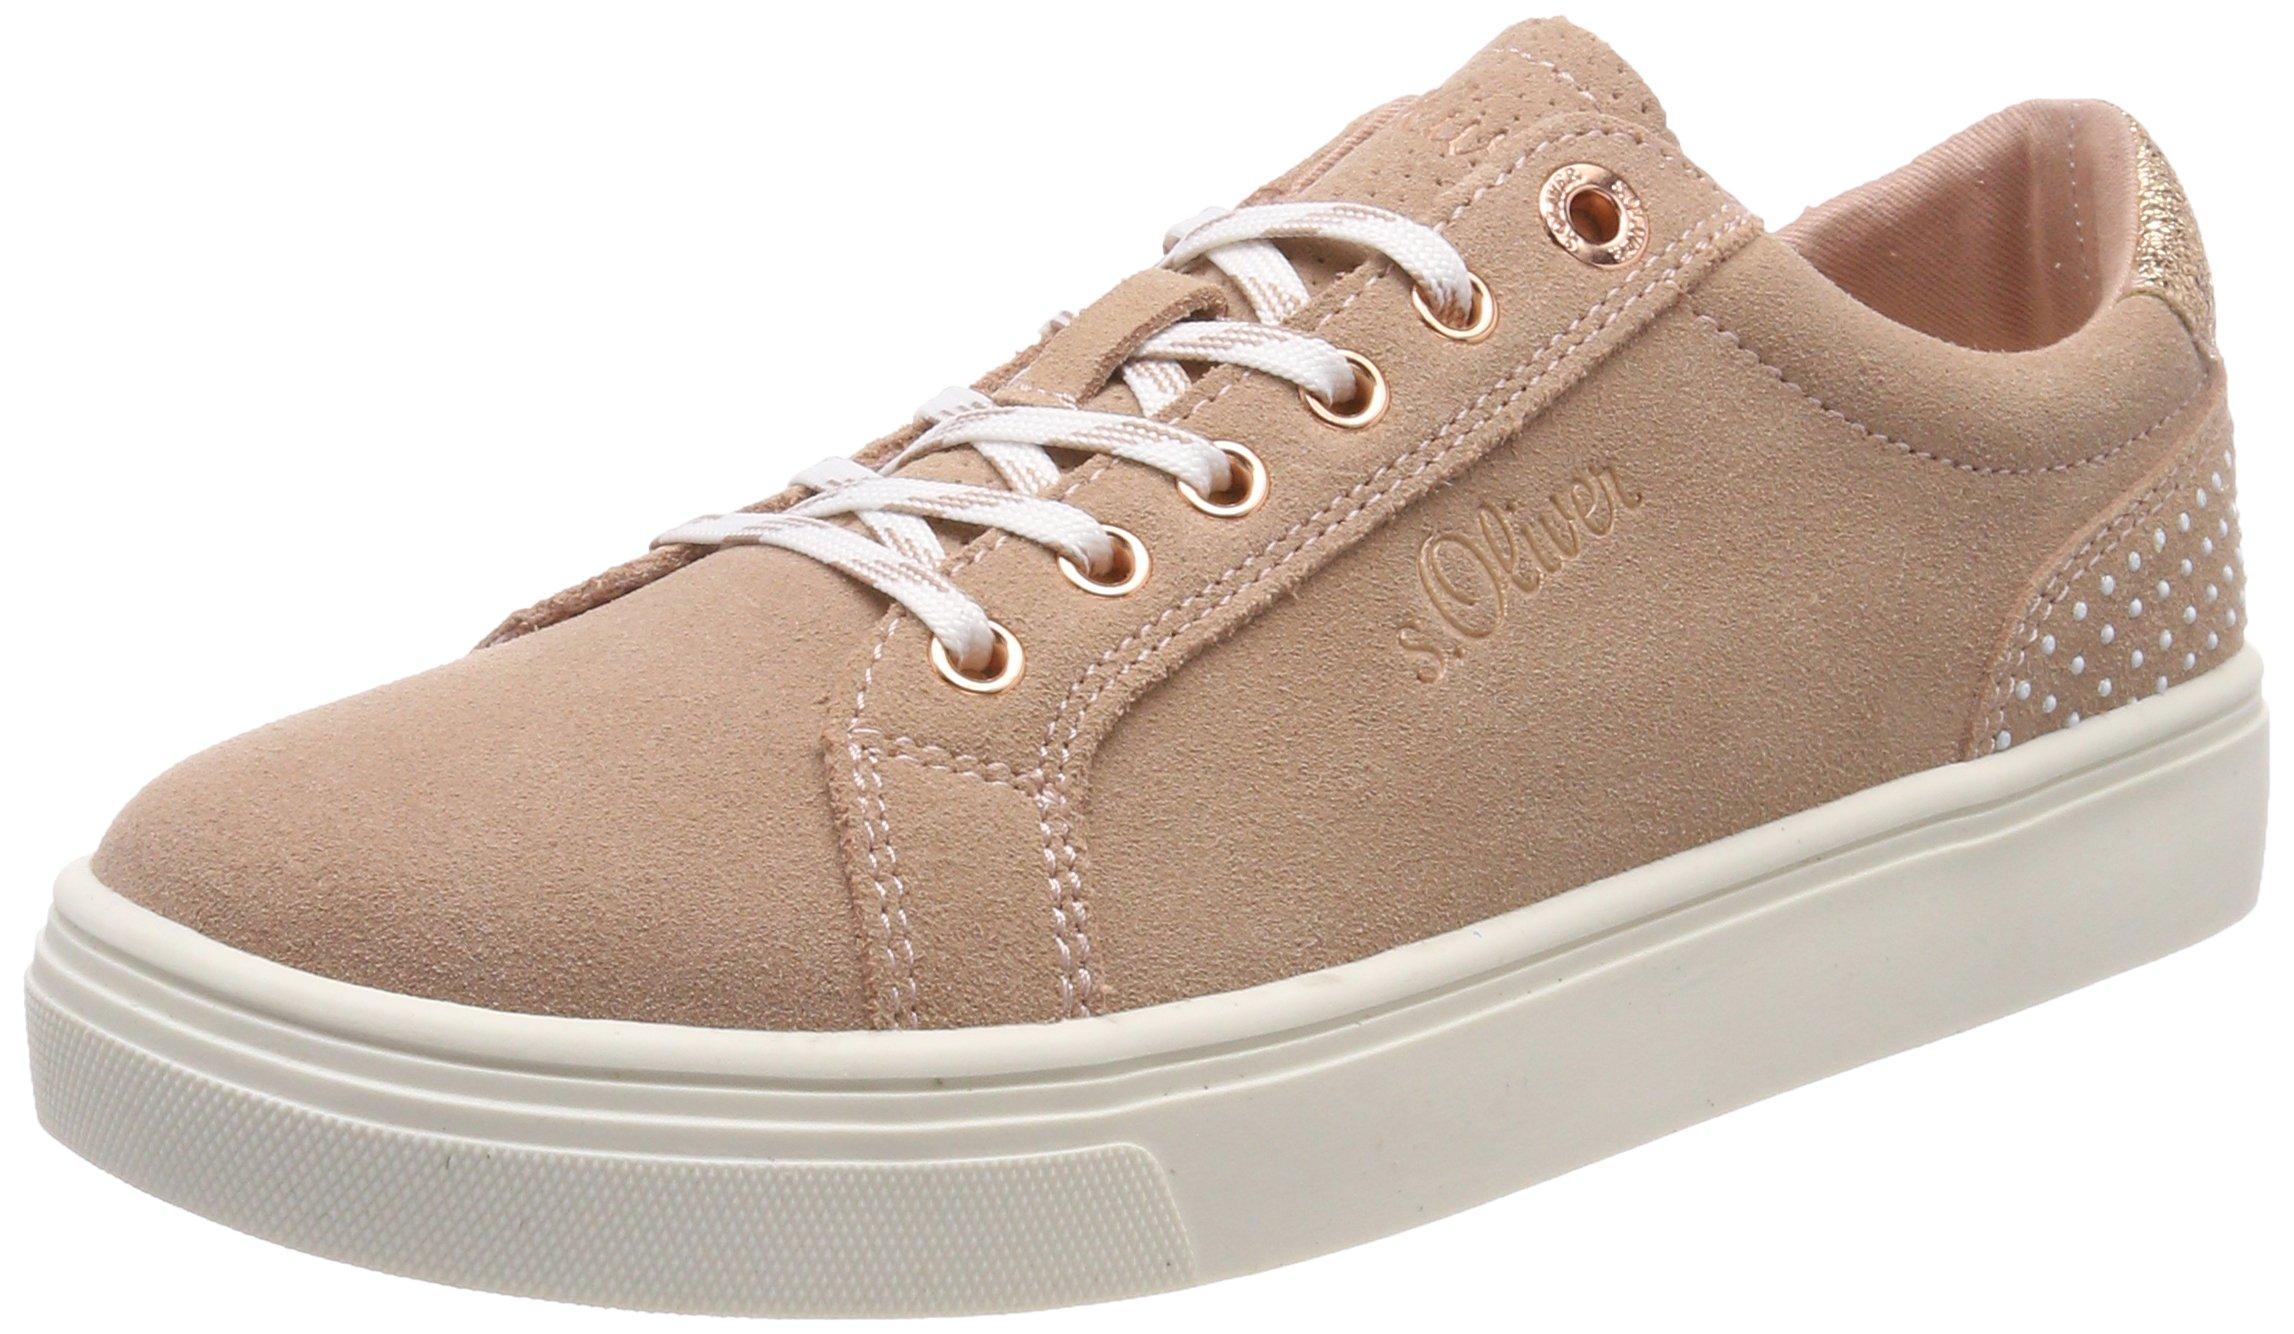 S Basses 23620Sneakers Femmeold Eu Rose39 oliver 0ONwm8nv